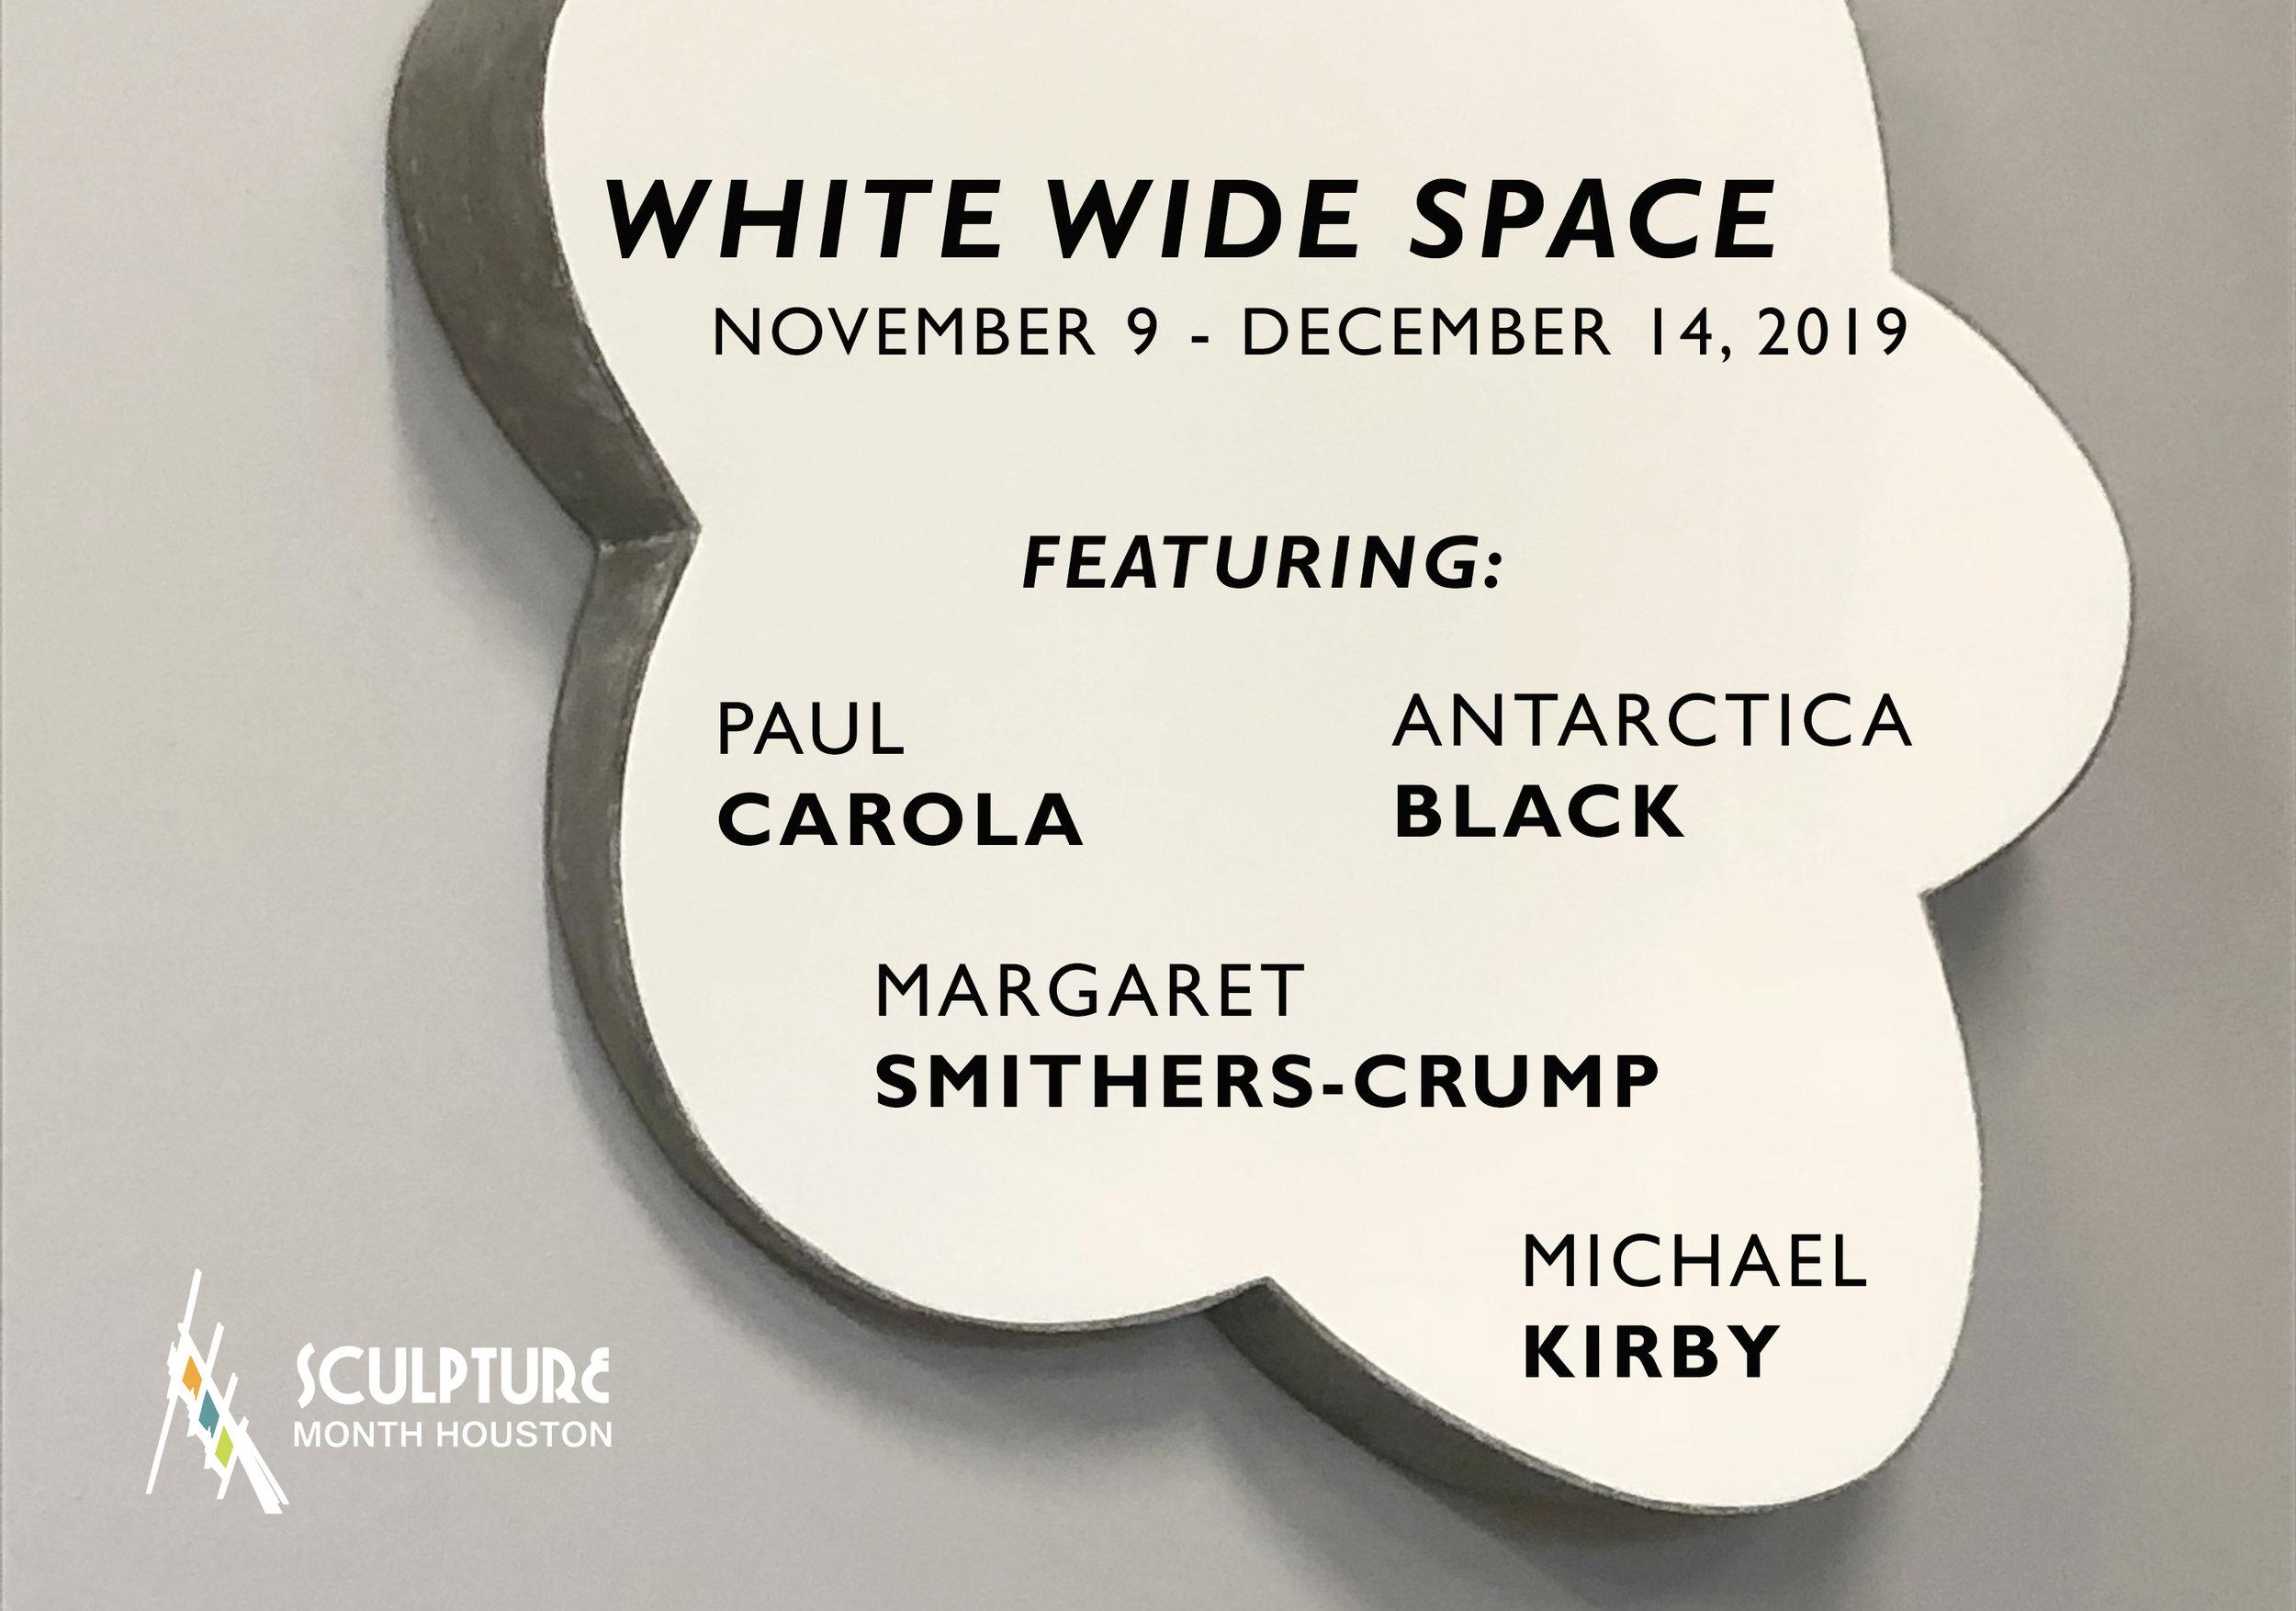 WhiteWideSpace.jpg